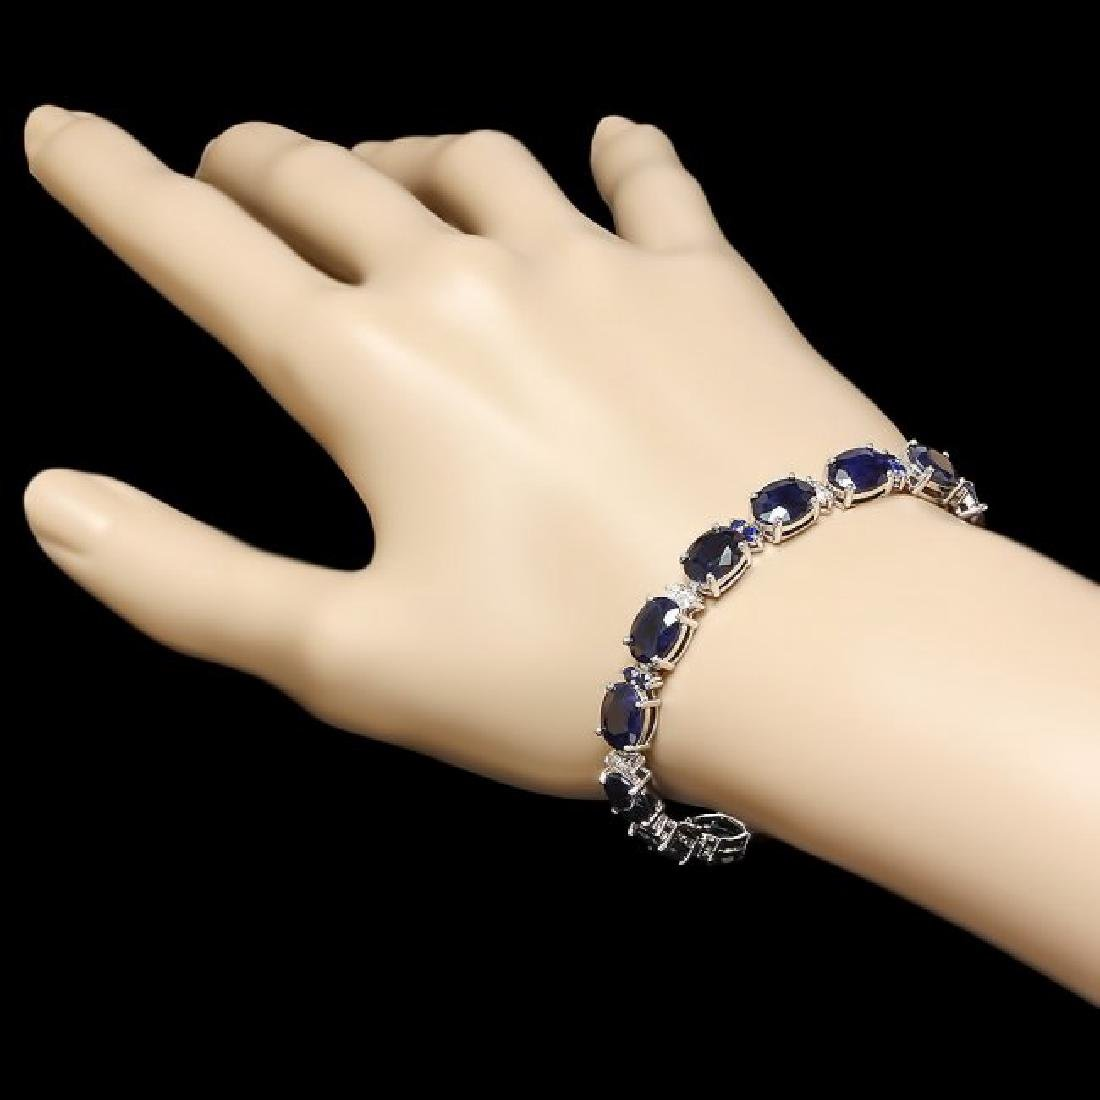 14k Gold 35ct Sapphire 0.70ct Diamond Bracelet - 5